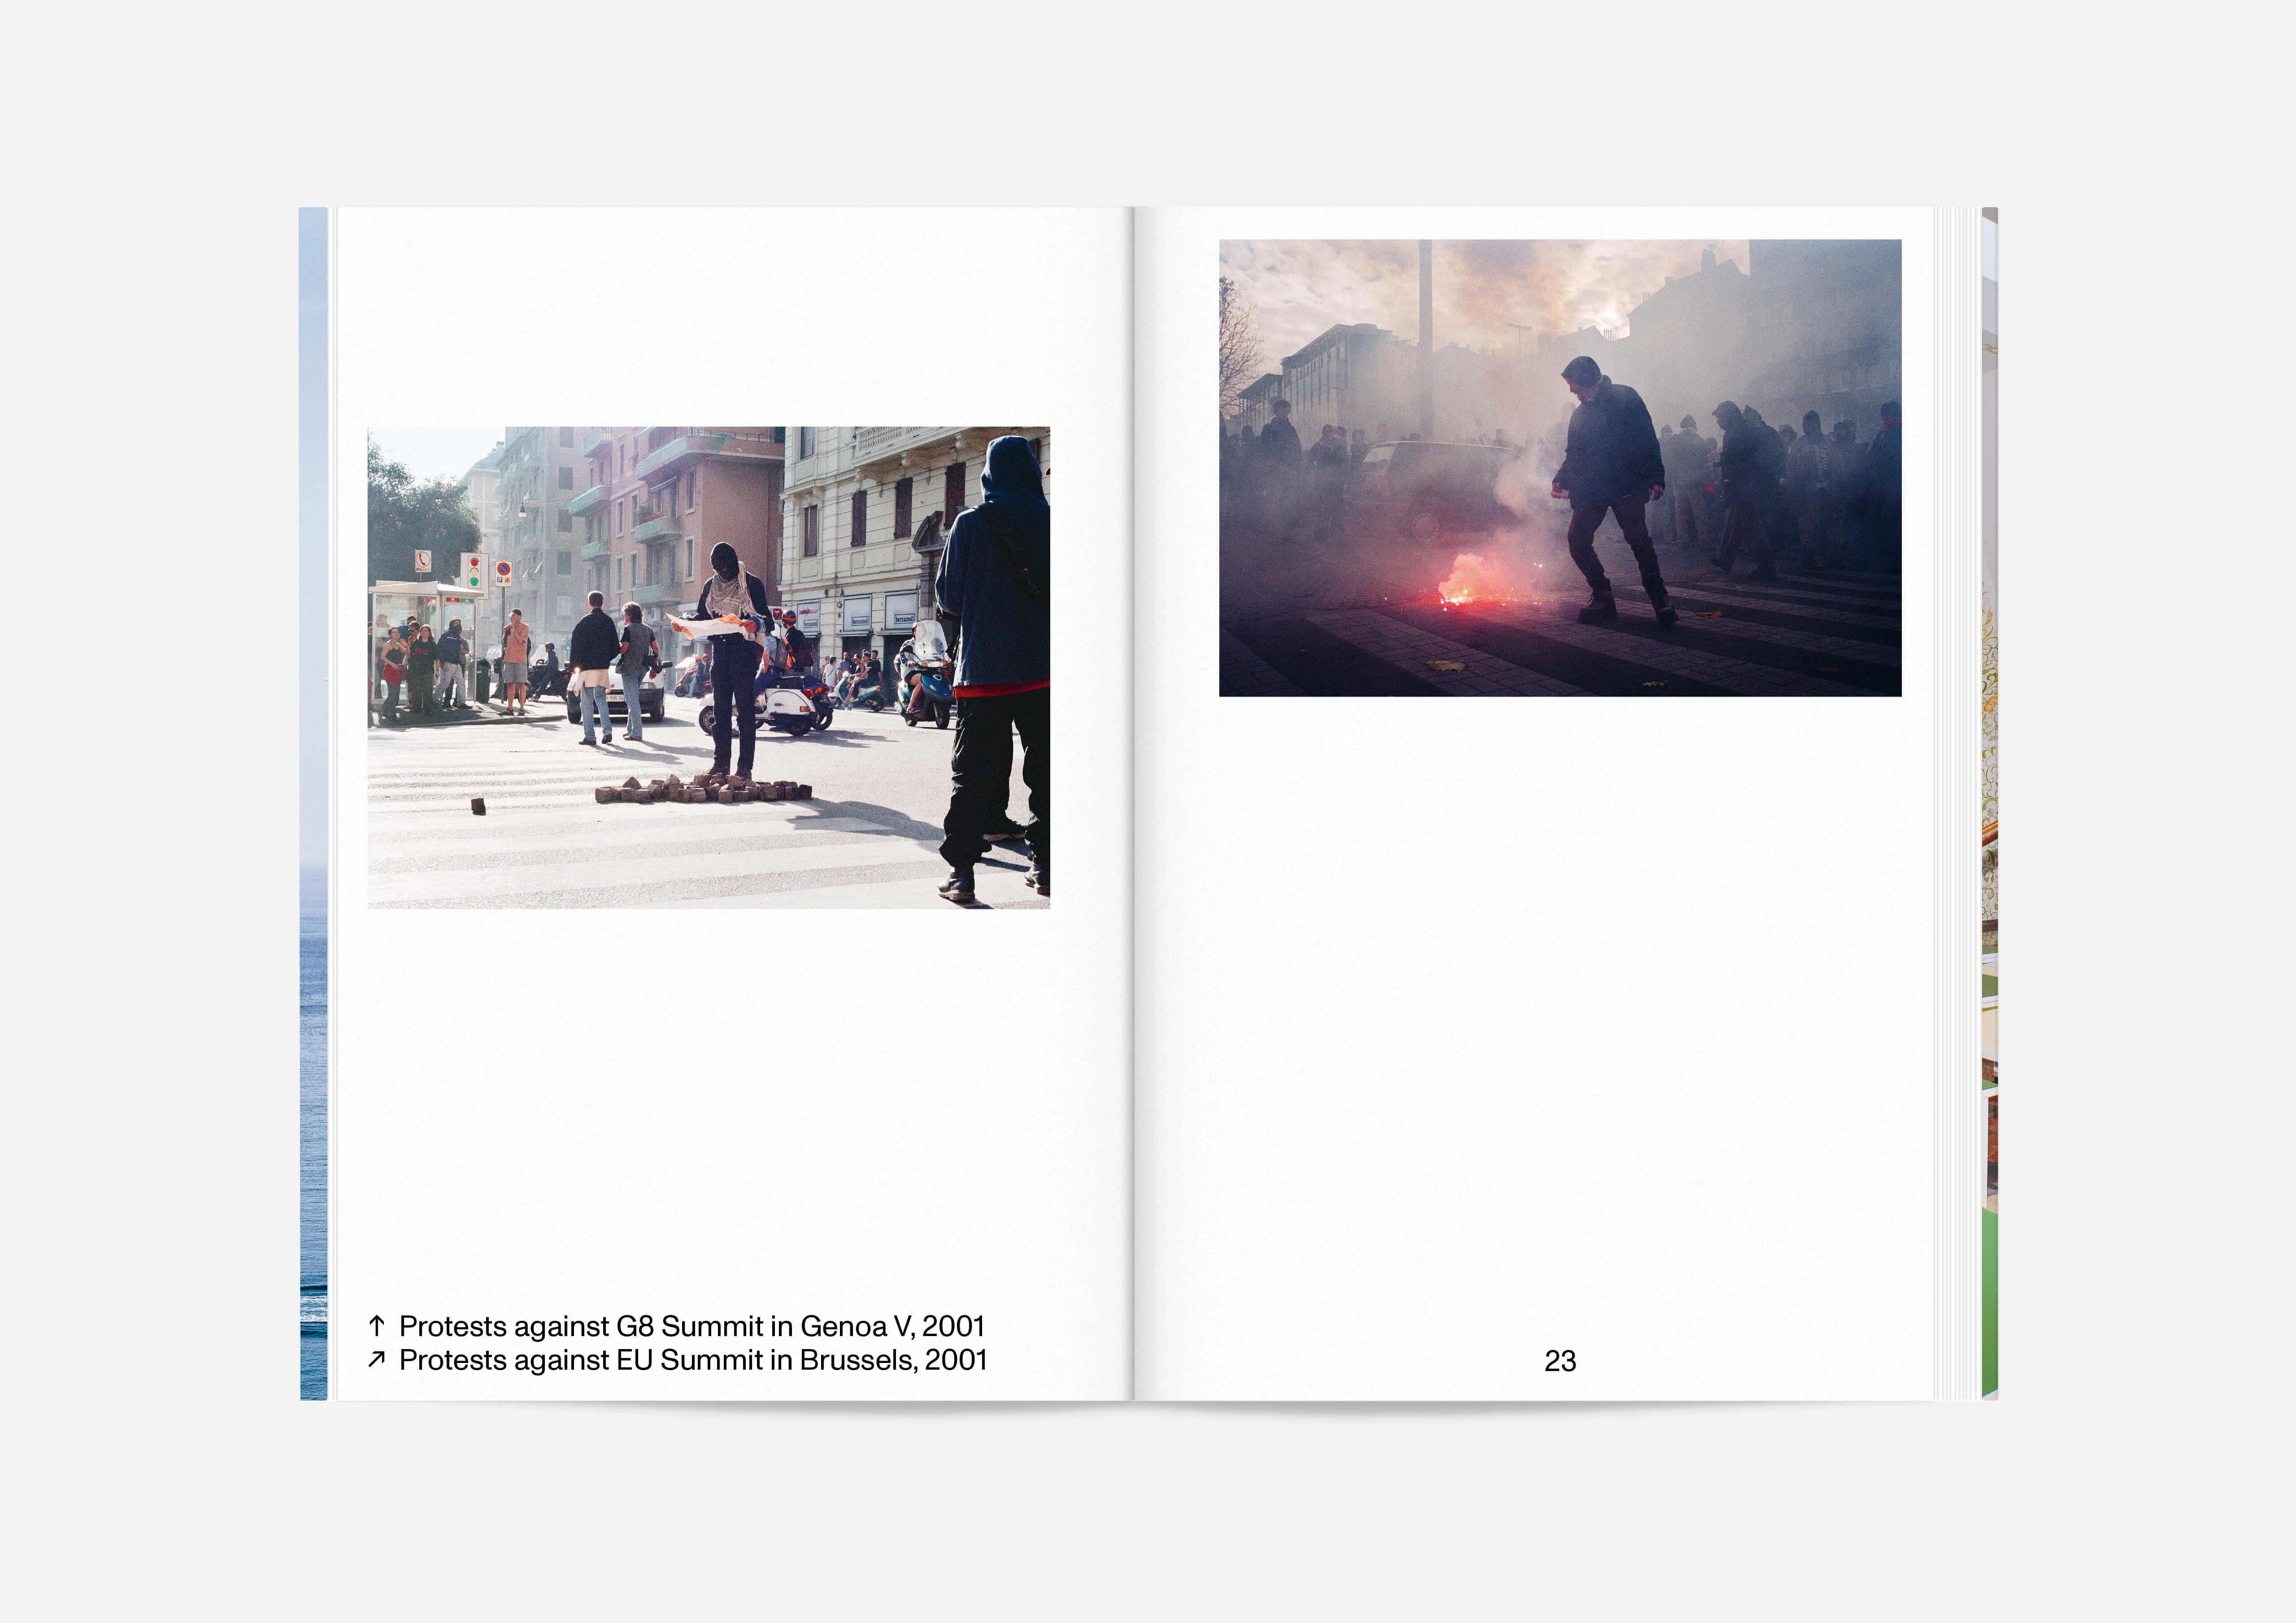 https://neuegestaltung.de/media/pages/clients/julian-roeder/3fe45f03d2-1610896614/jr-glauben_07.jpg